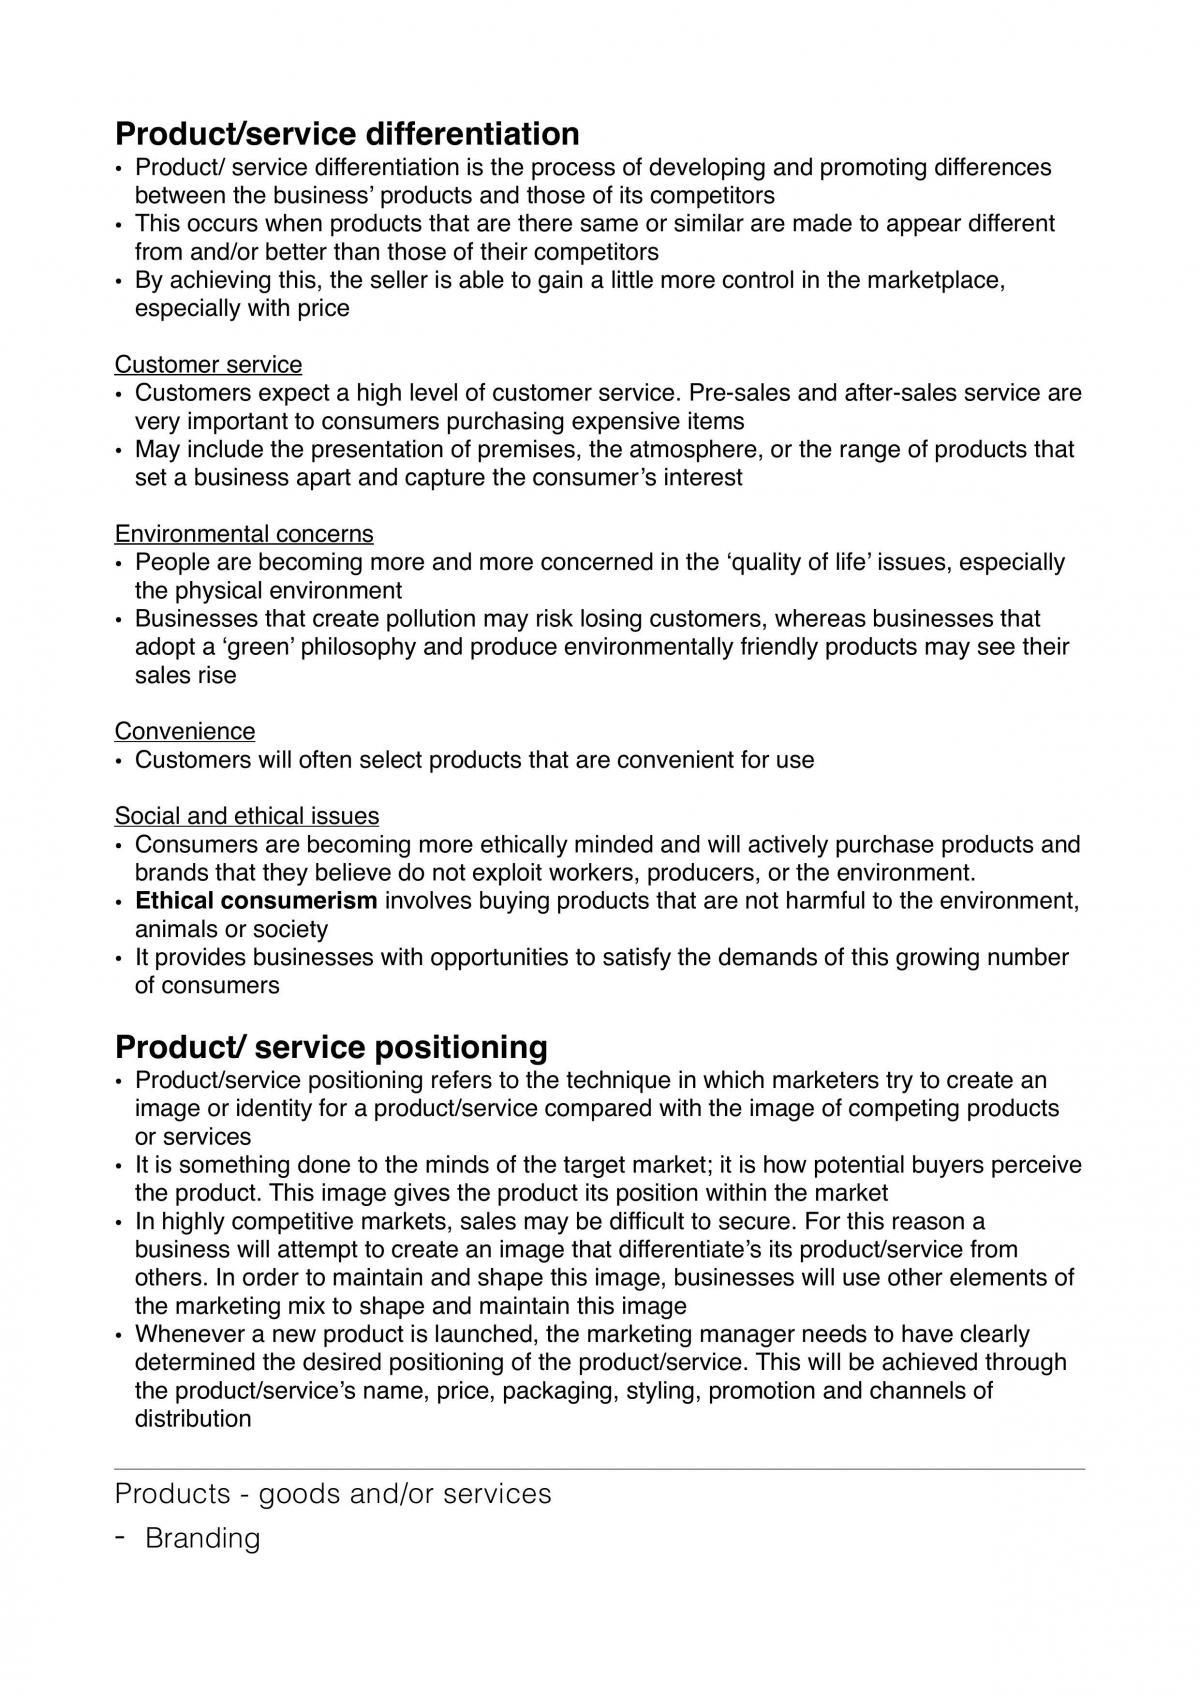 HSC Business Studies Module 2 Marketing notes - Page 21